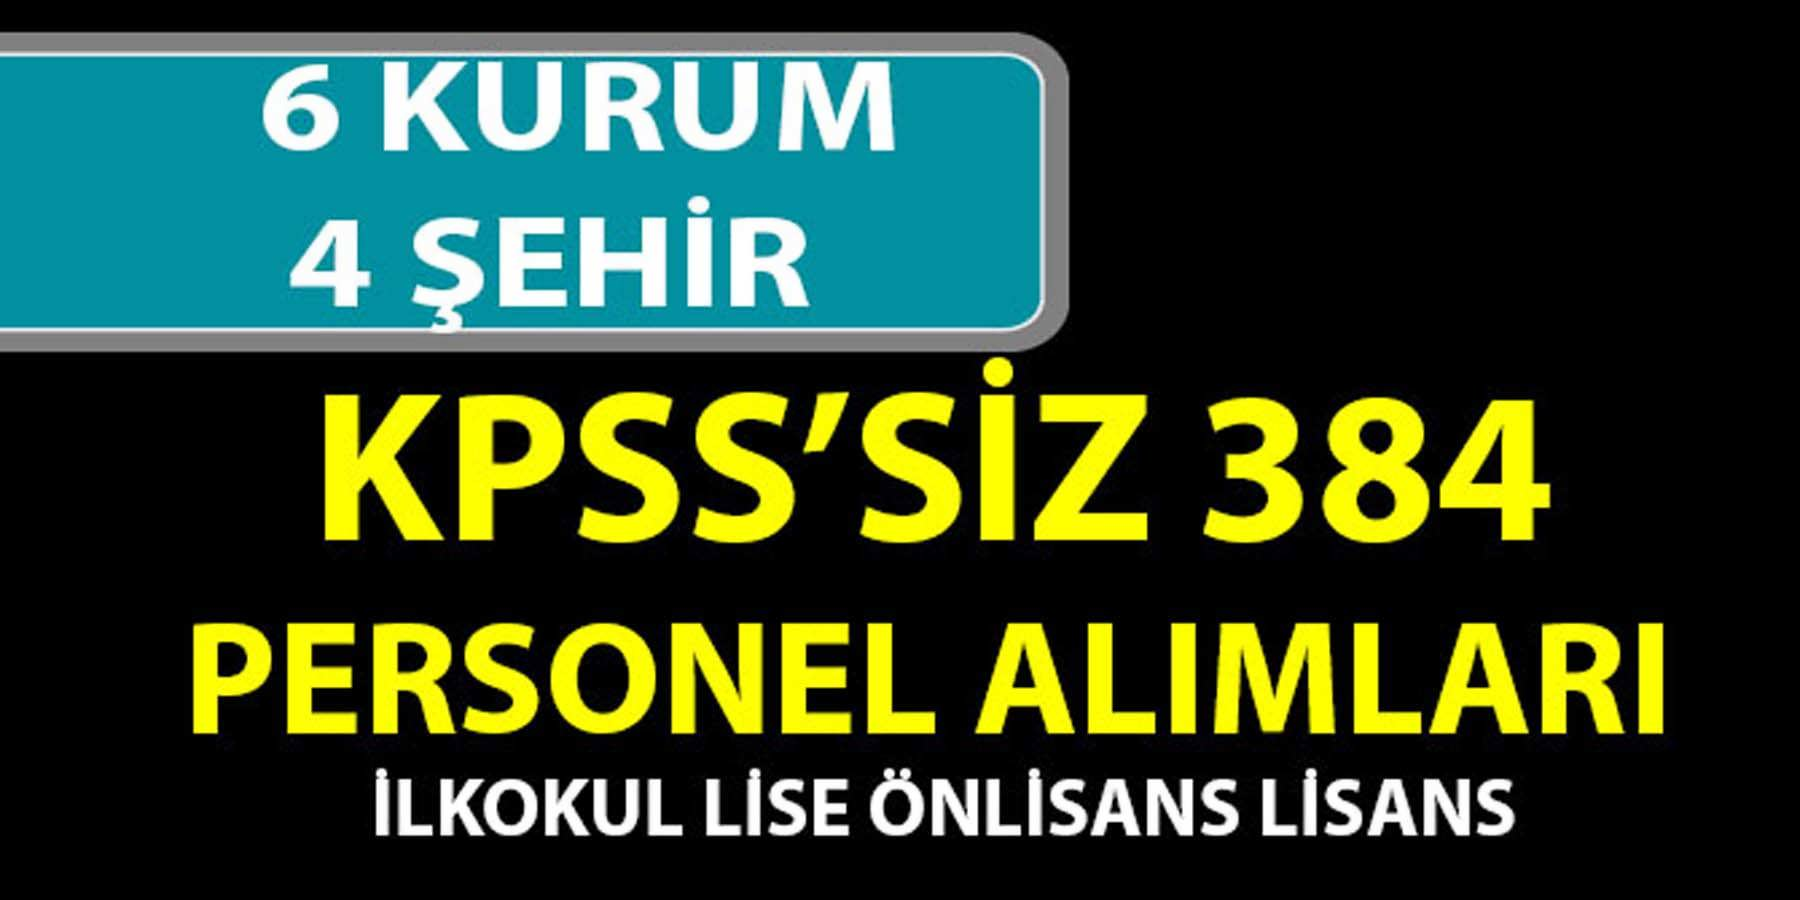 KPSS'Siz 384 Kişi 4 İL 6 Kurum Personel Alımı